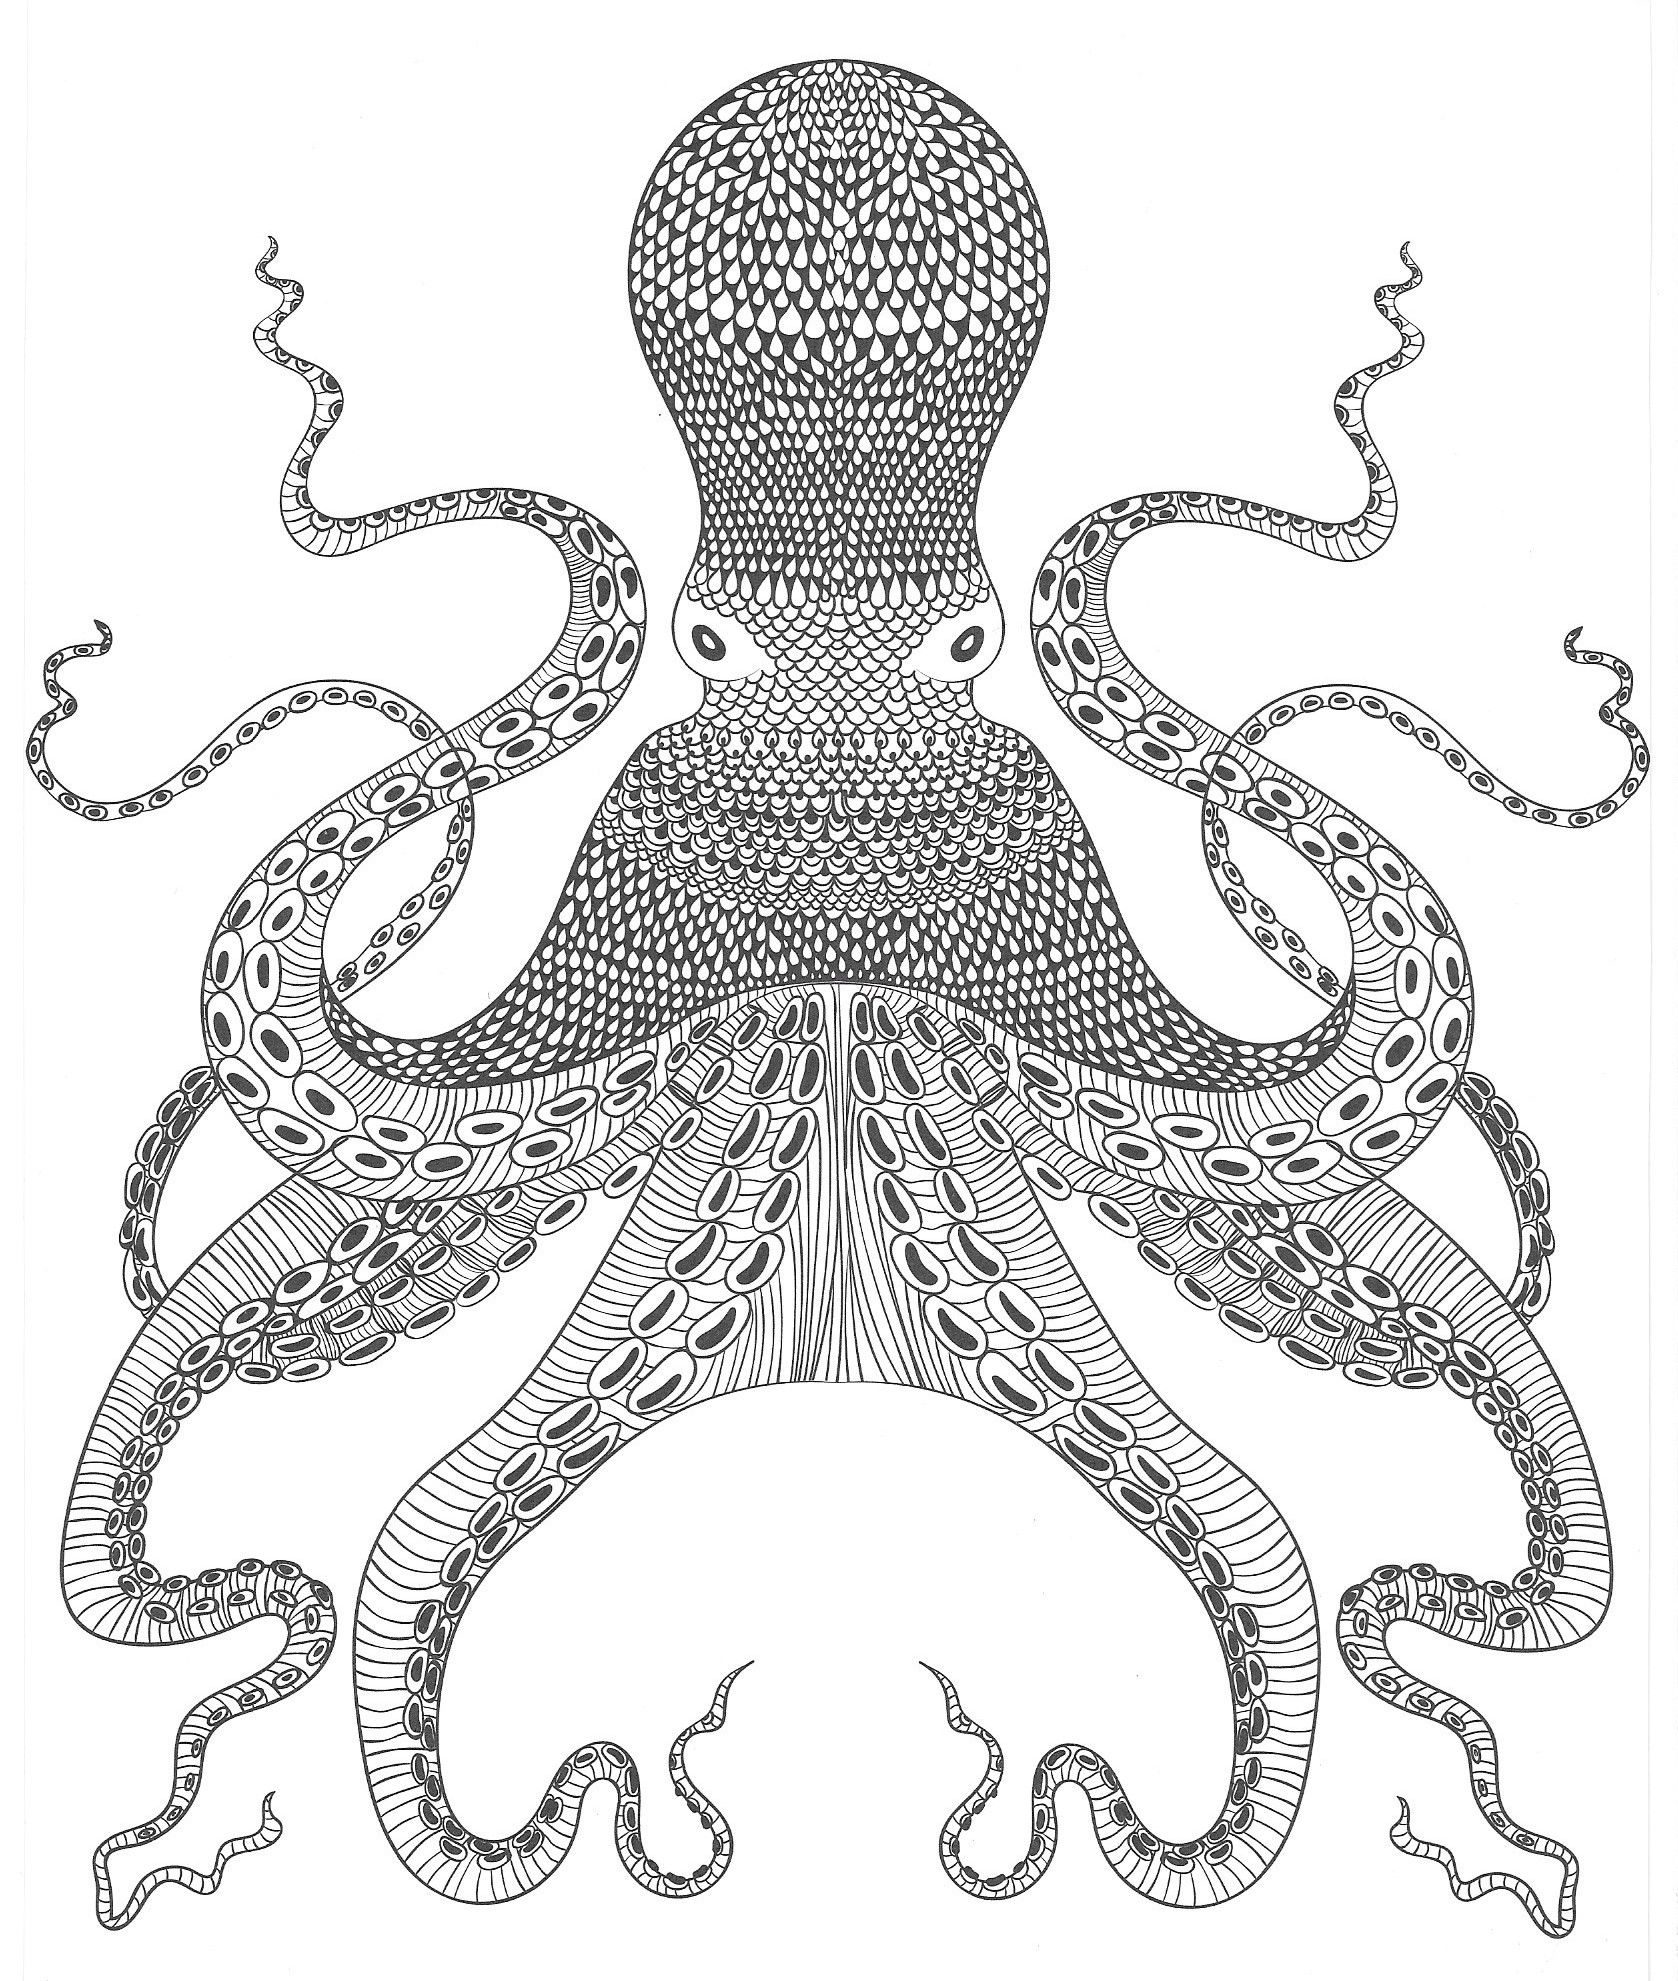 Krake Oktopus | Malvorlagen - Coloring Pages | Pinterest